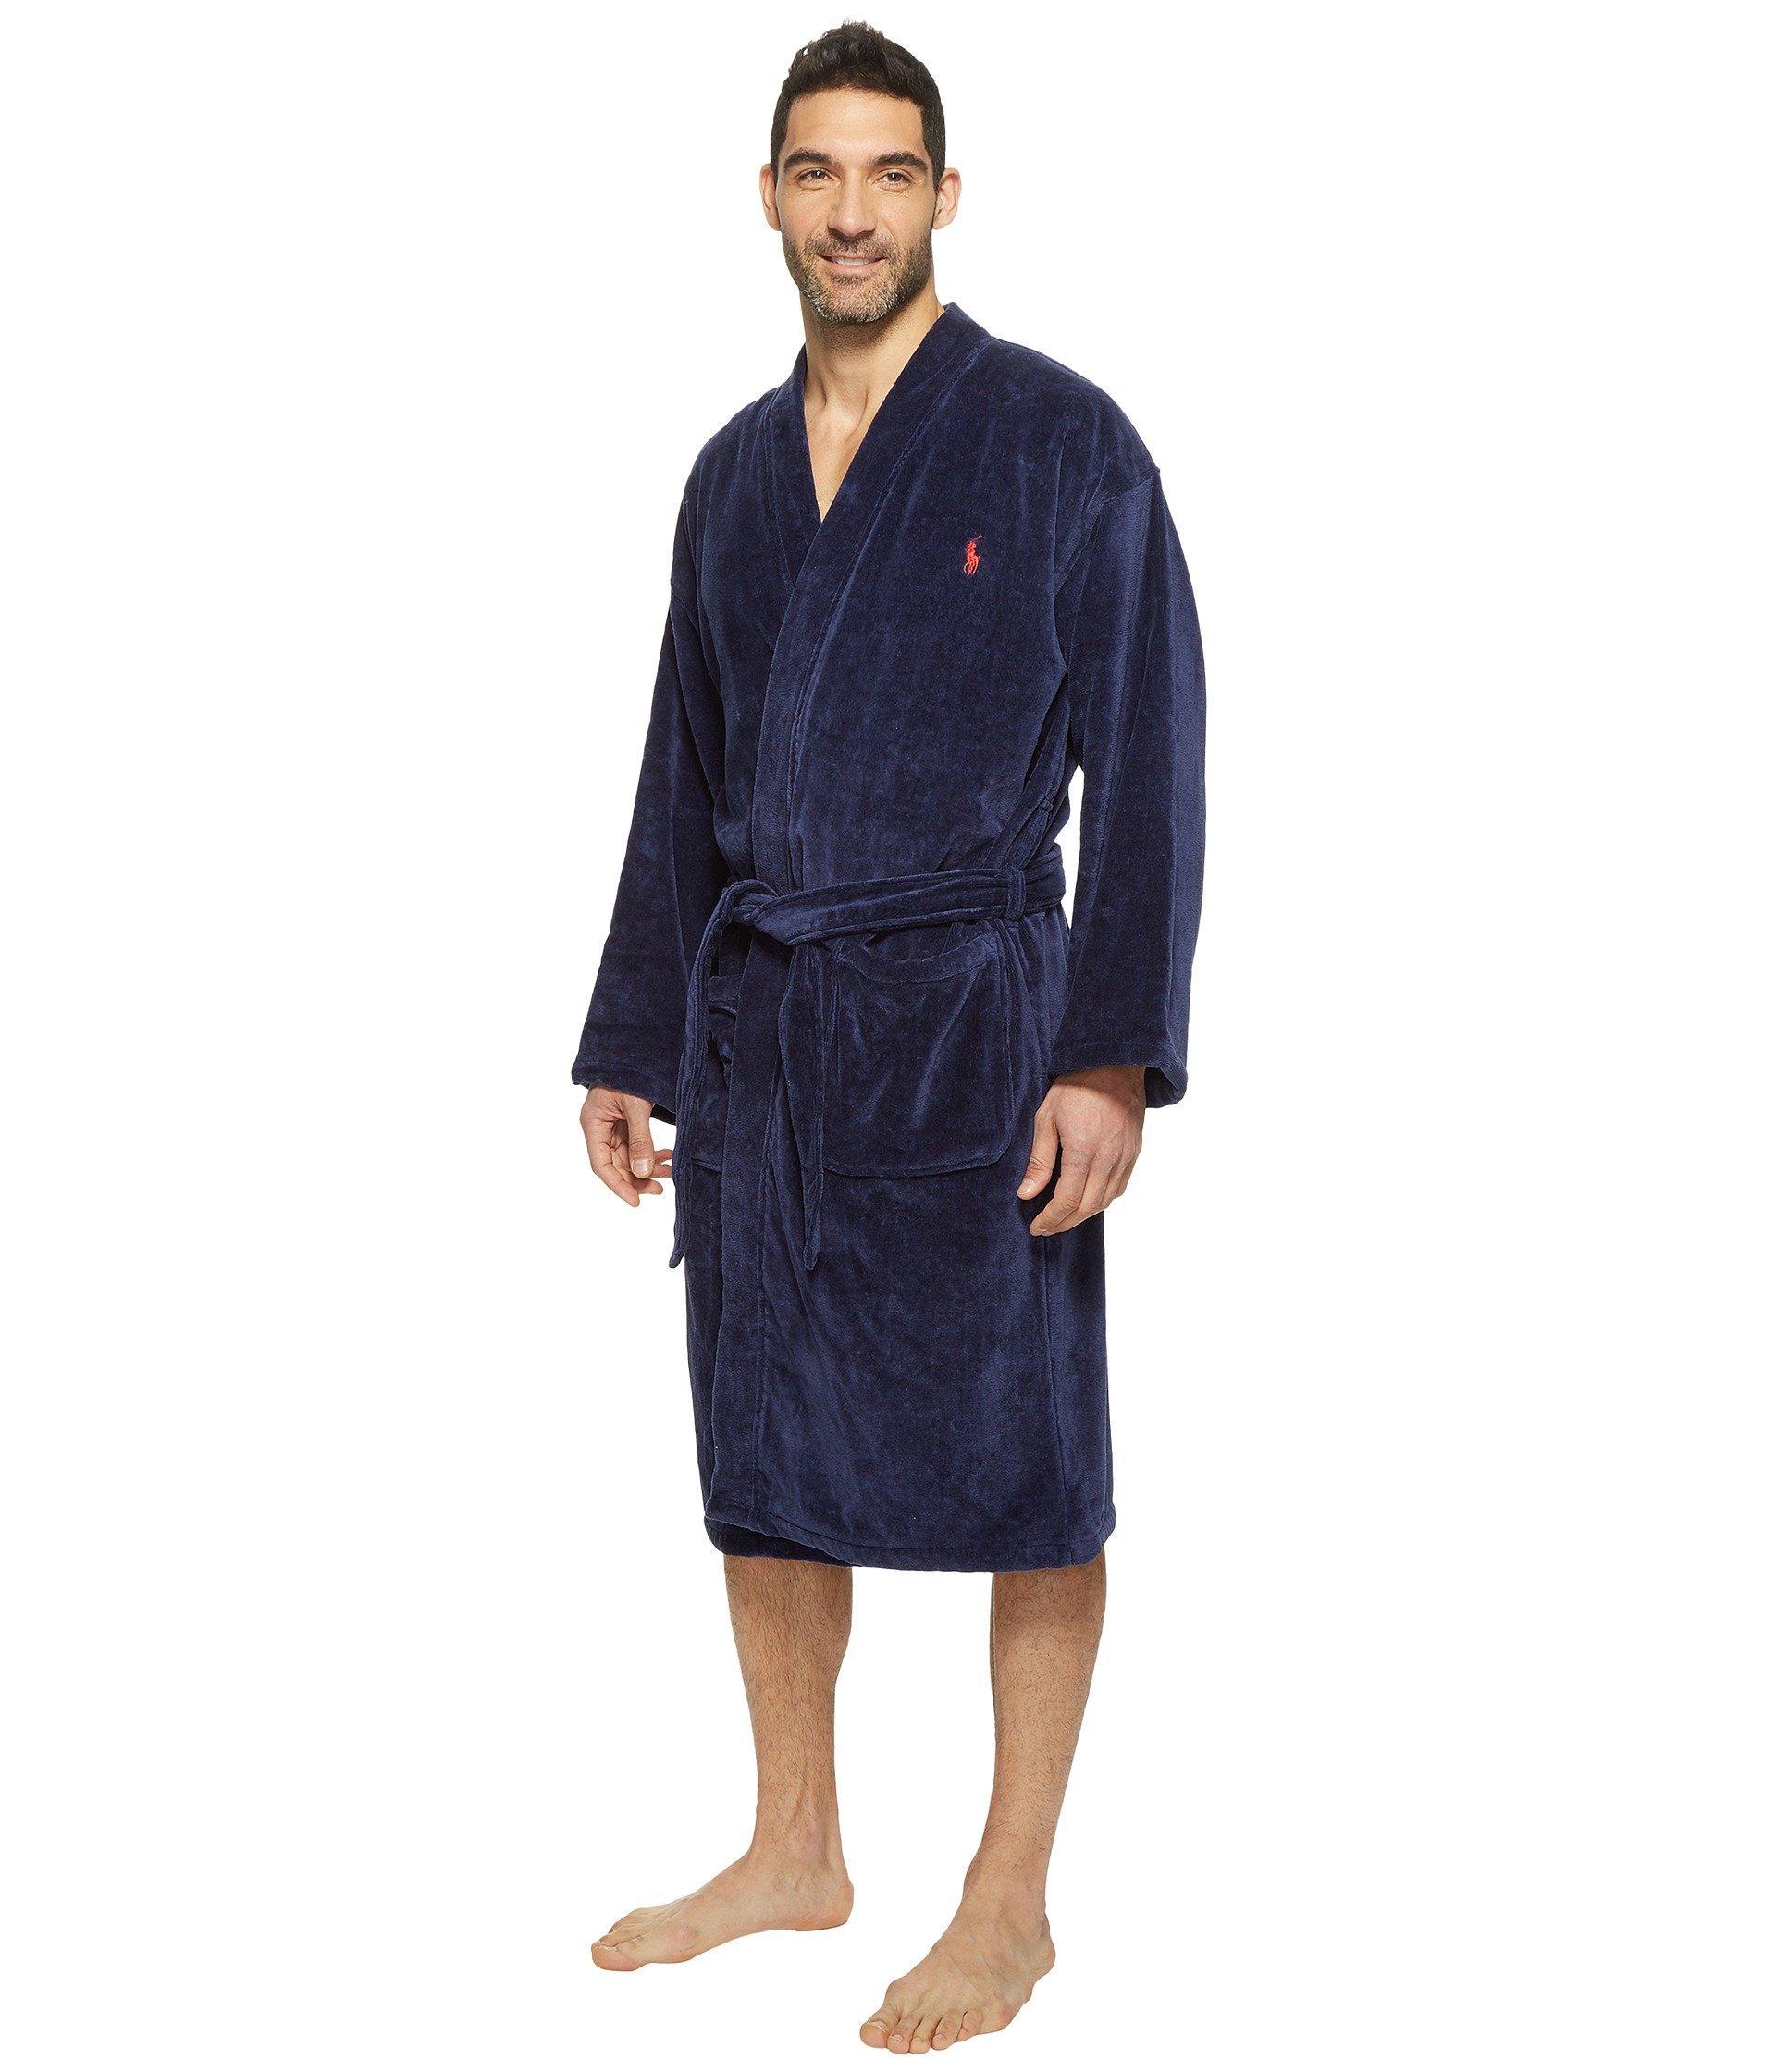 Lyst - Polo Ralph Lauren Terry Shawl Robe (white) Men s Robe in Blue for Men febb252c7